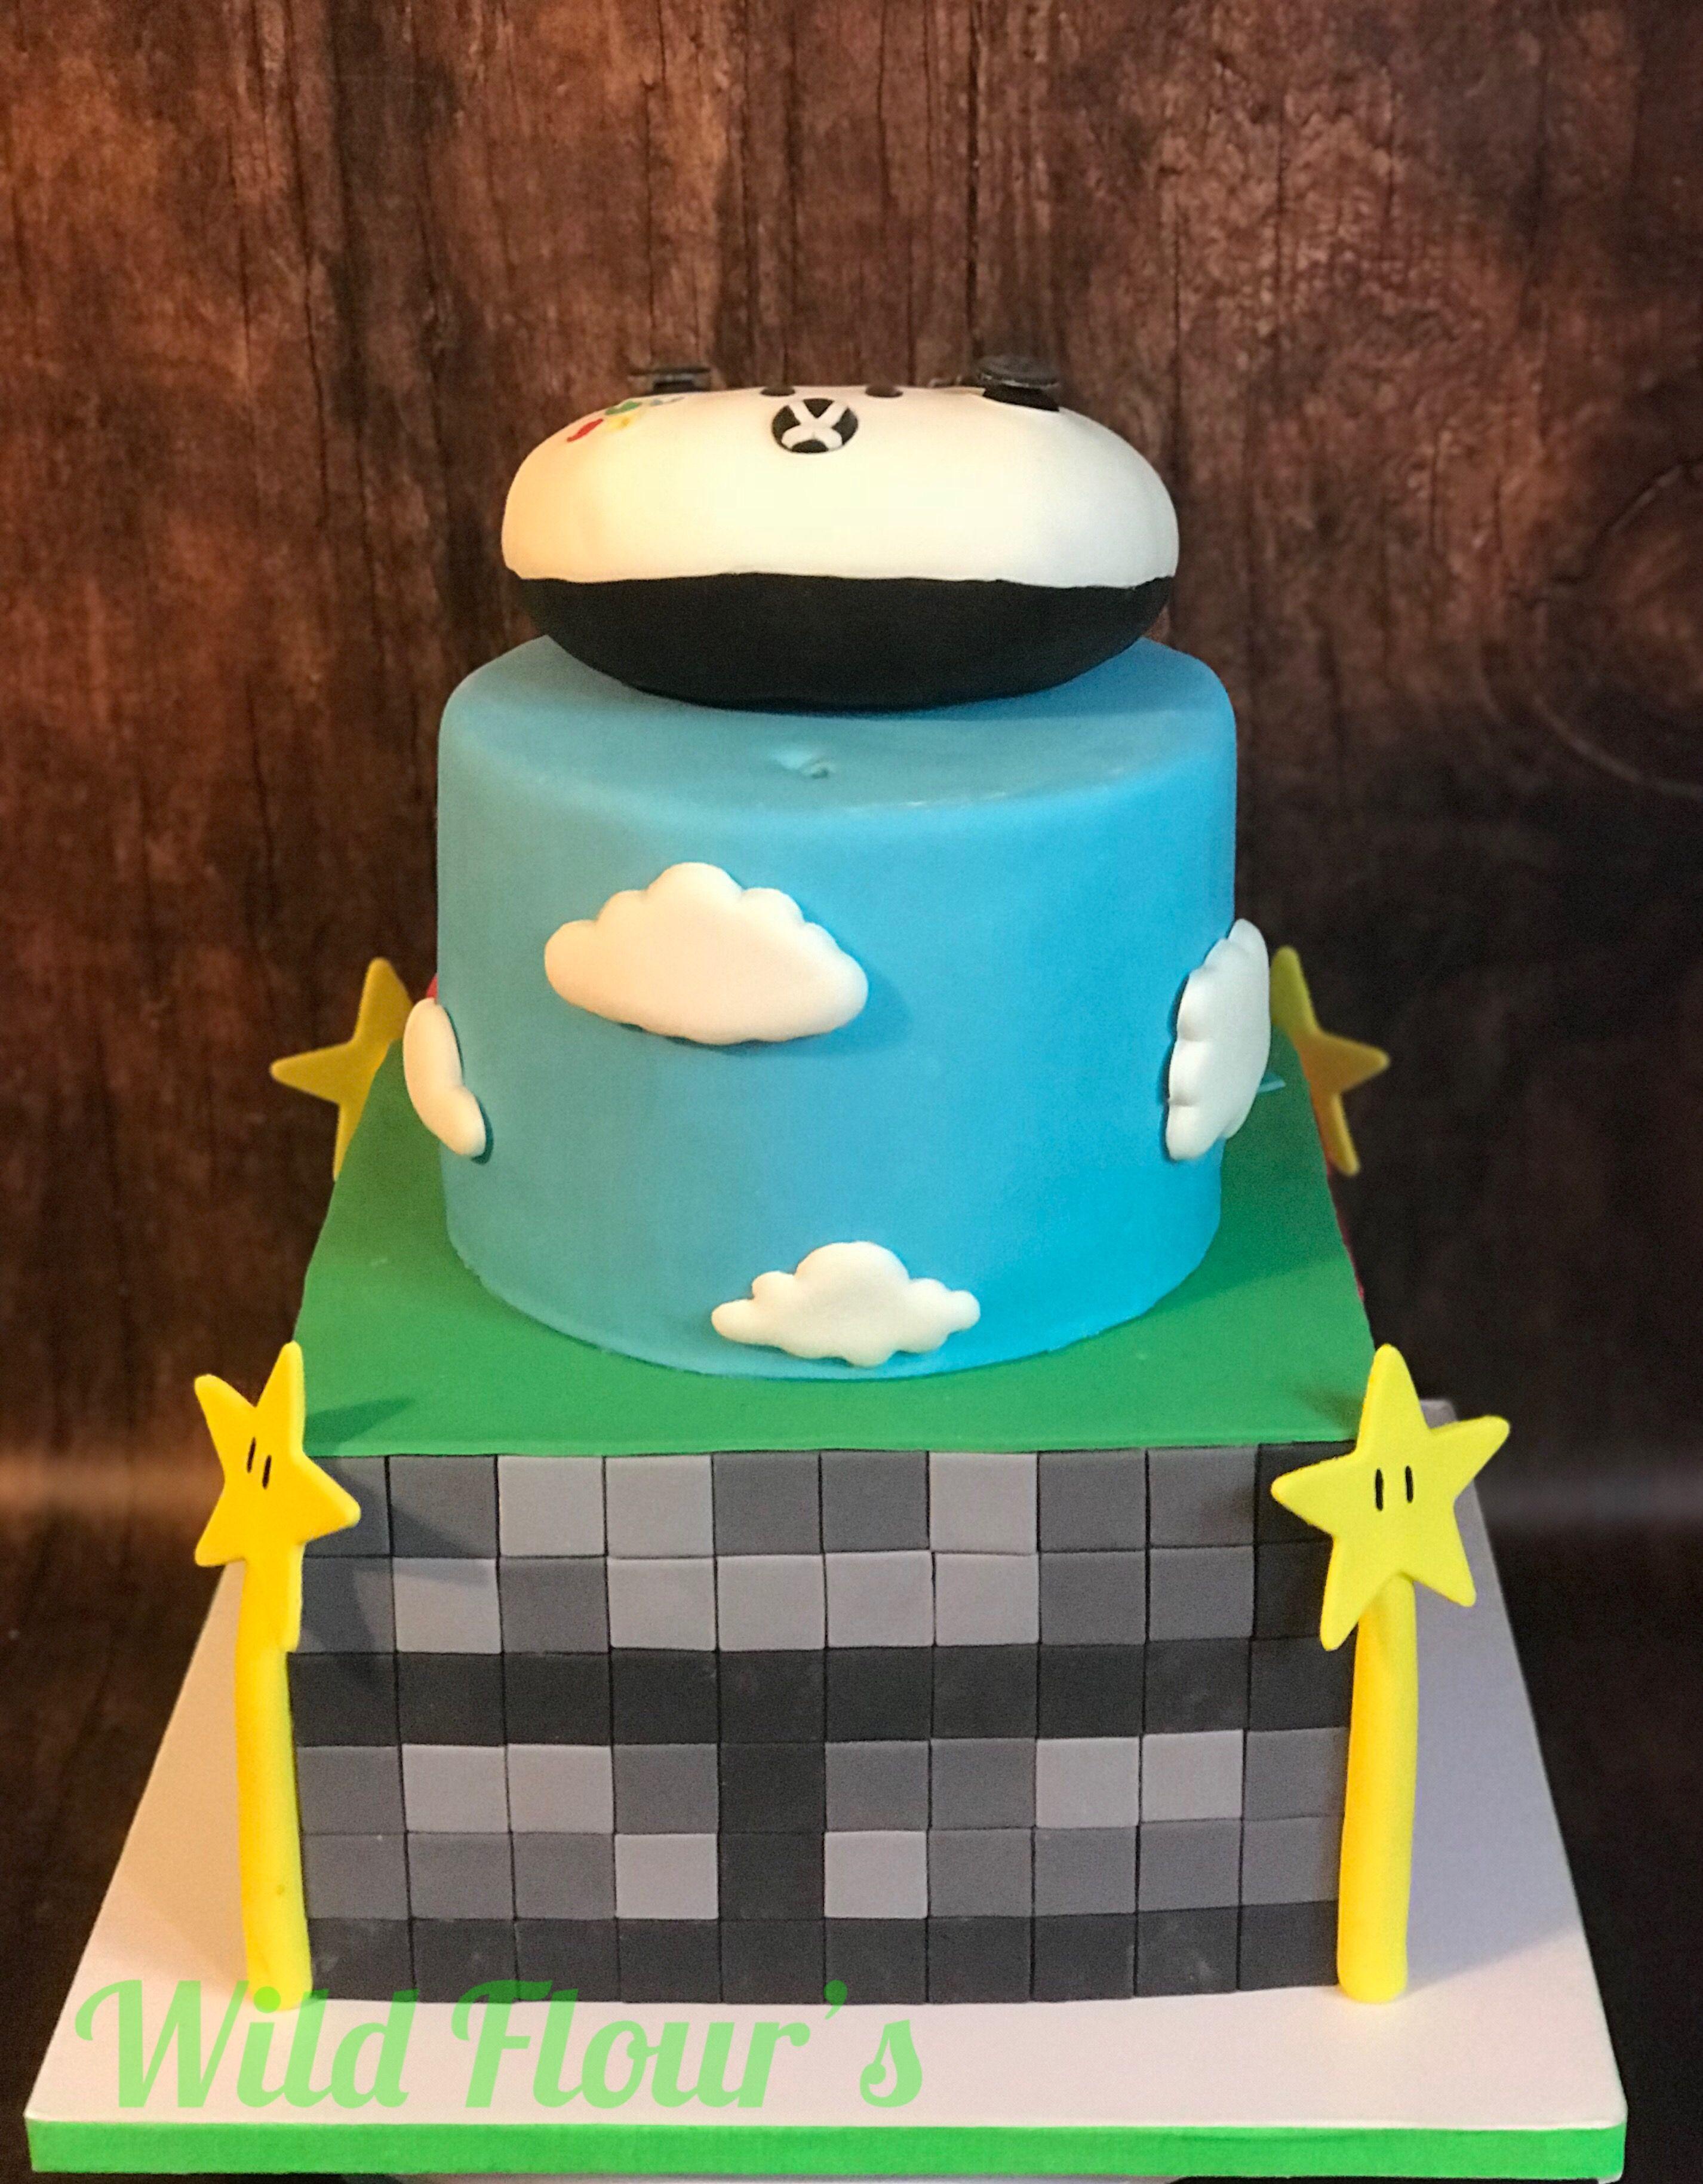 Minecraft, Super Mario Gaming cake. Rice Krispie Treat